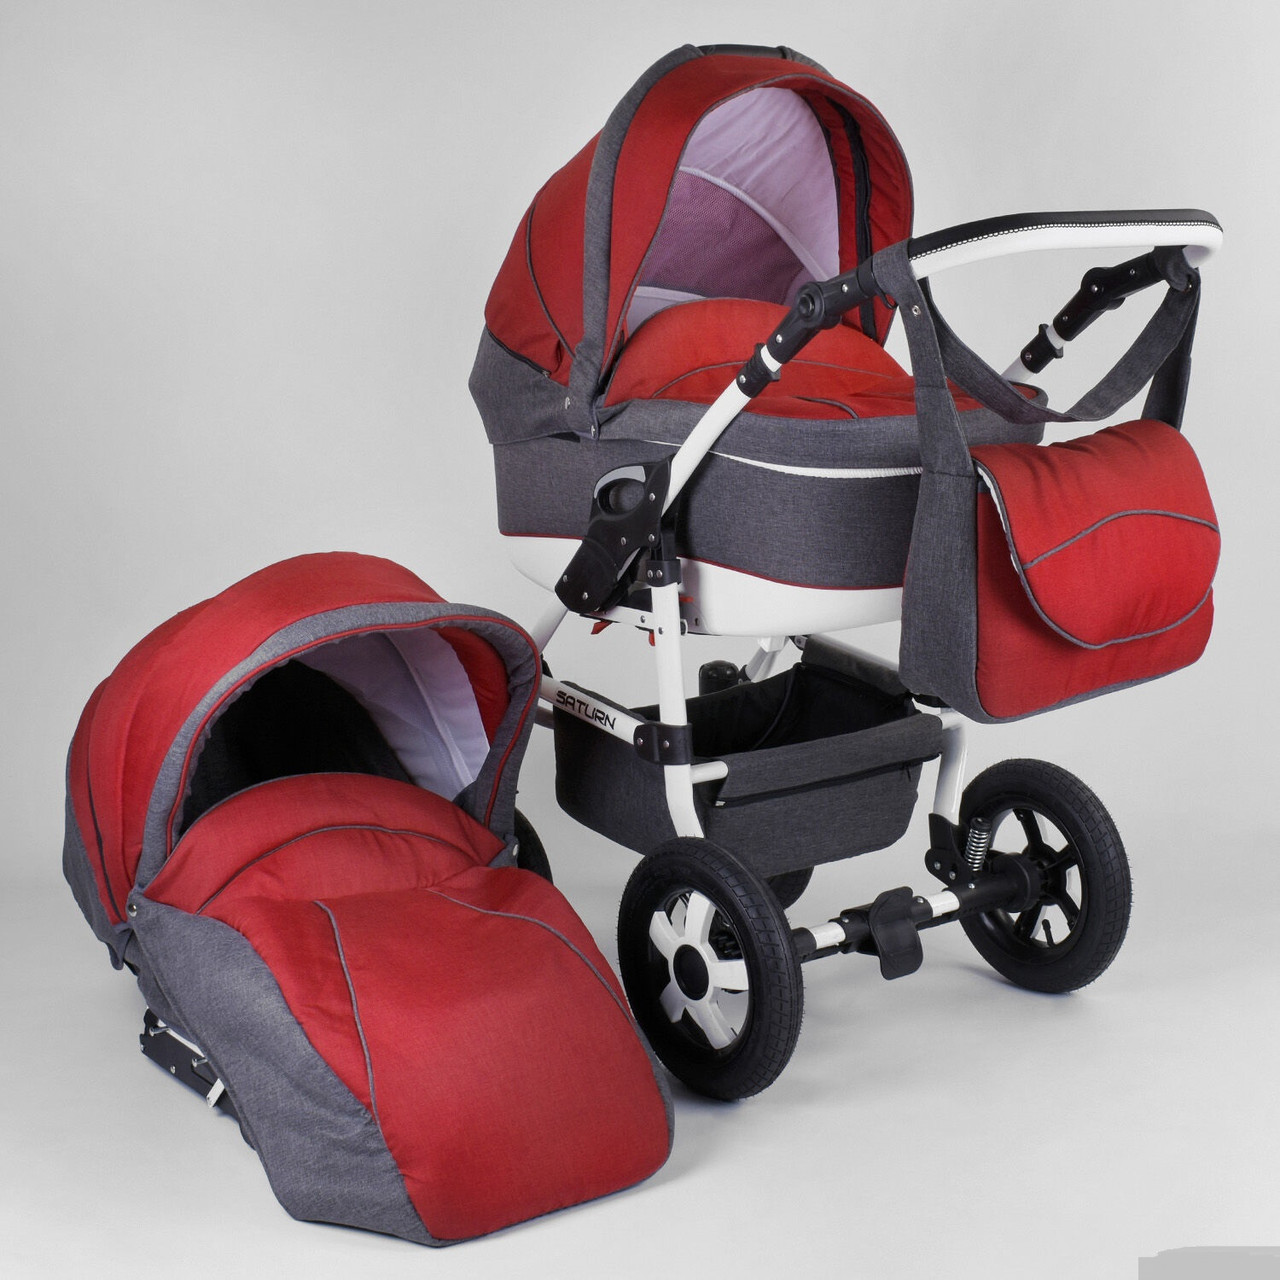 Коляска для детей Saturn ЛЕН БЕЛАЯ РАМА № 0186-L28 цвет серый с красным